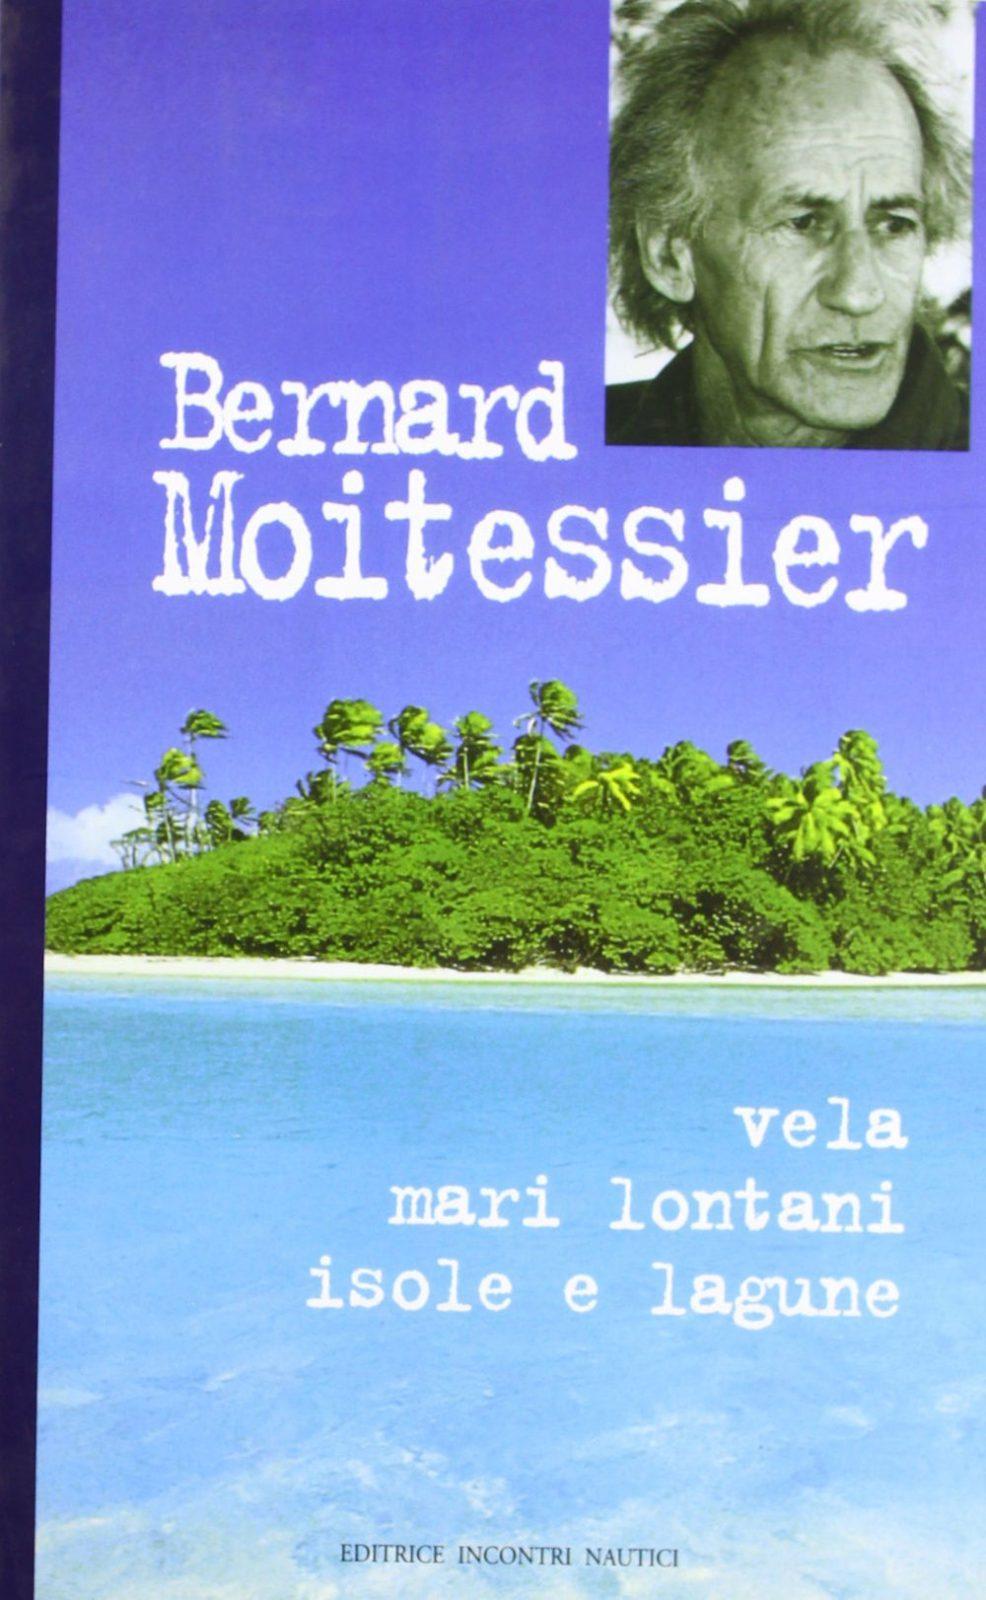 Bernard Moitessier - Vela, Mari lontani, isole e lagune